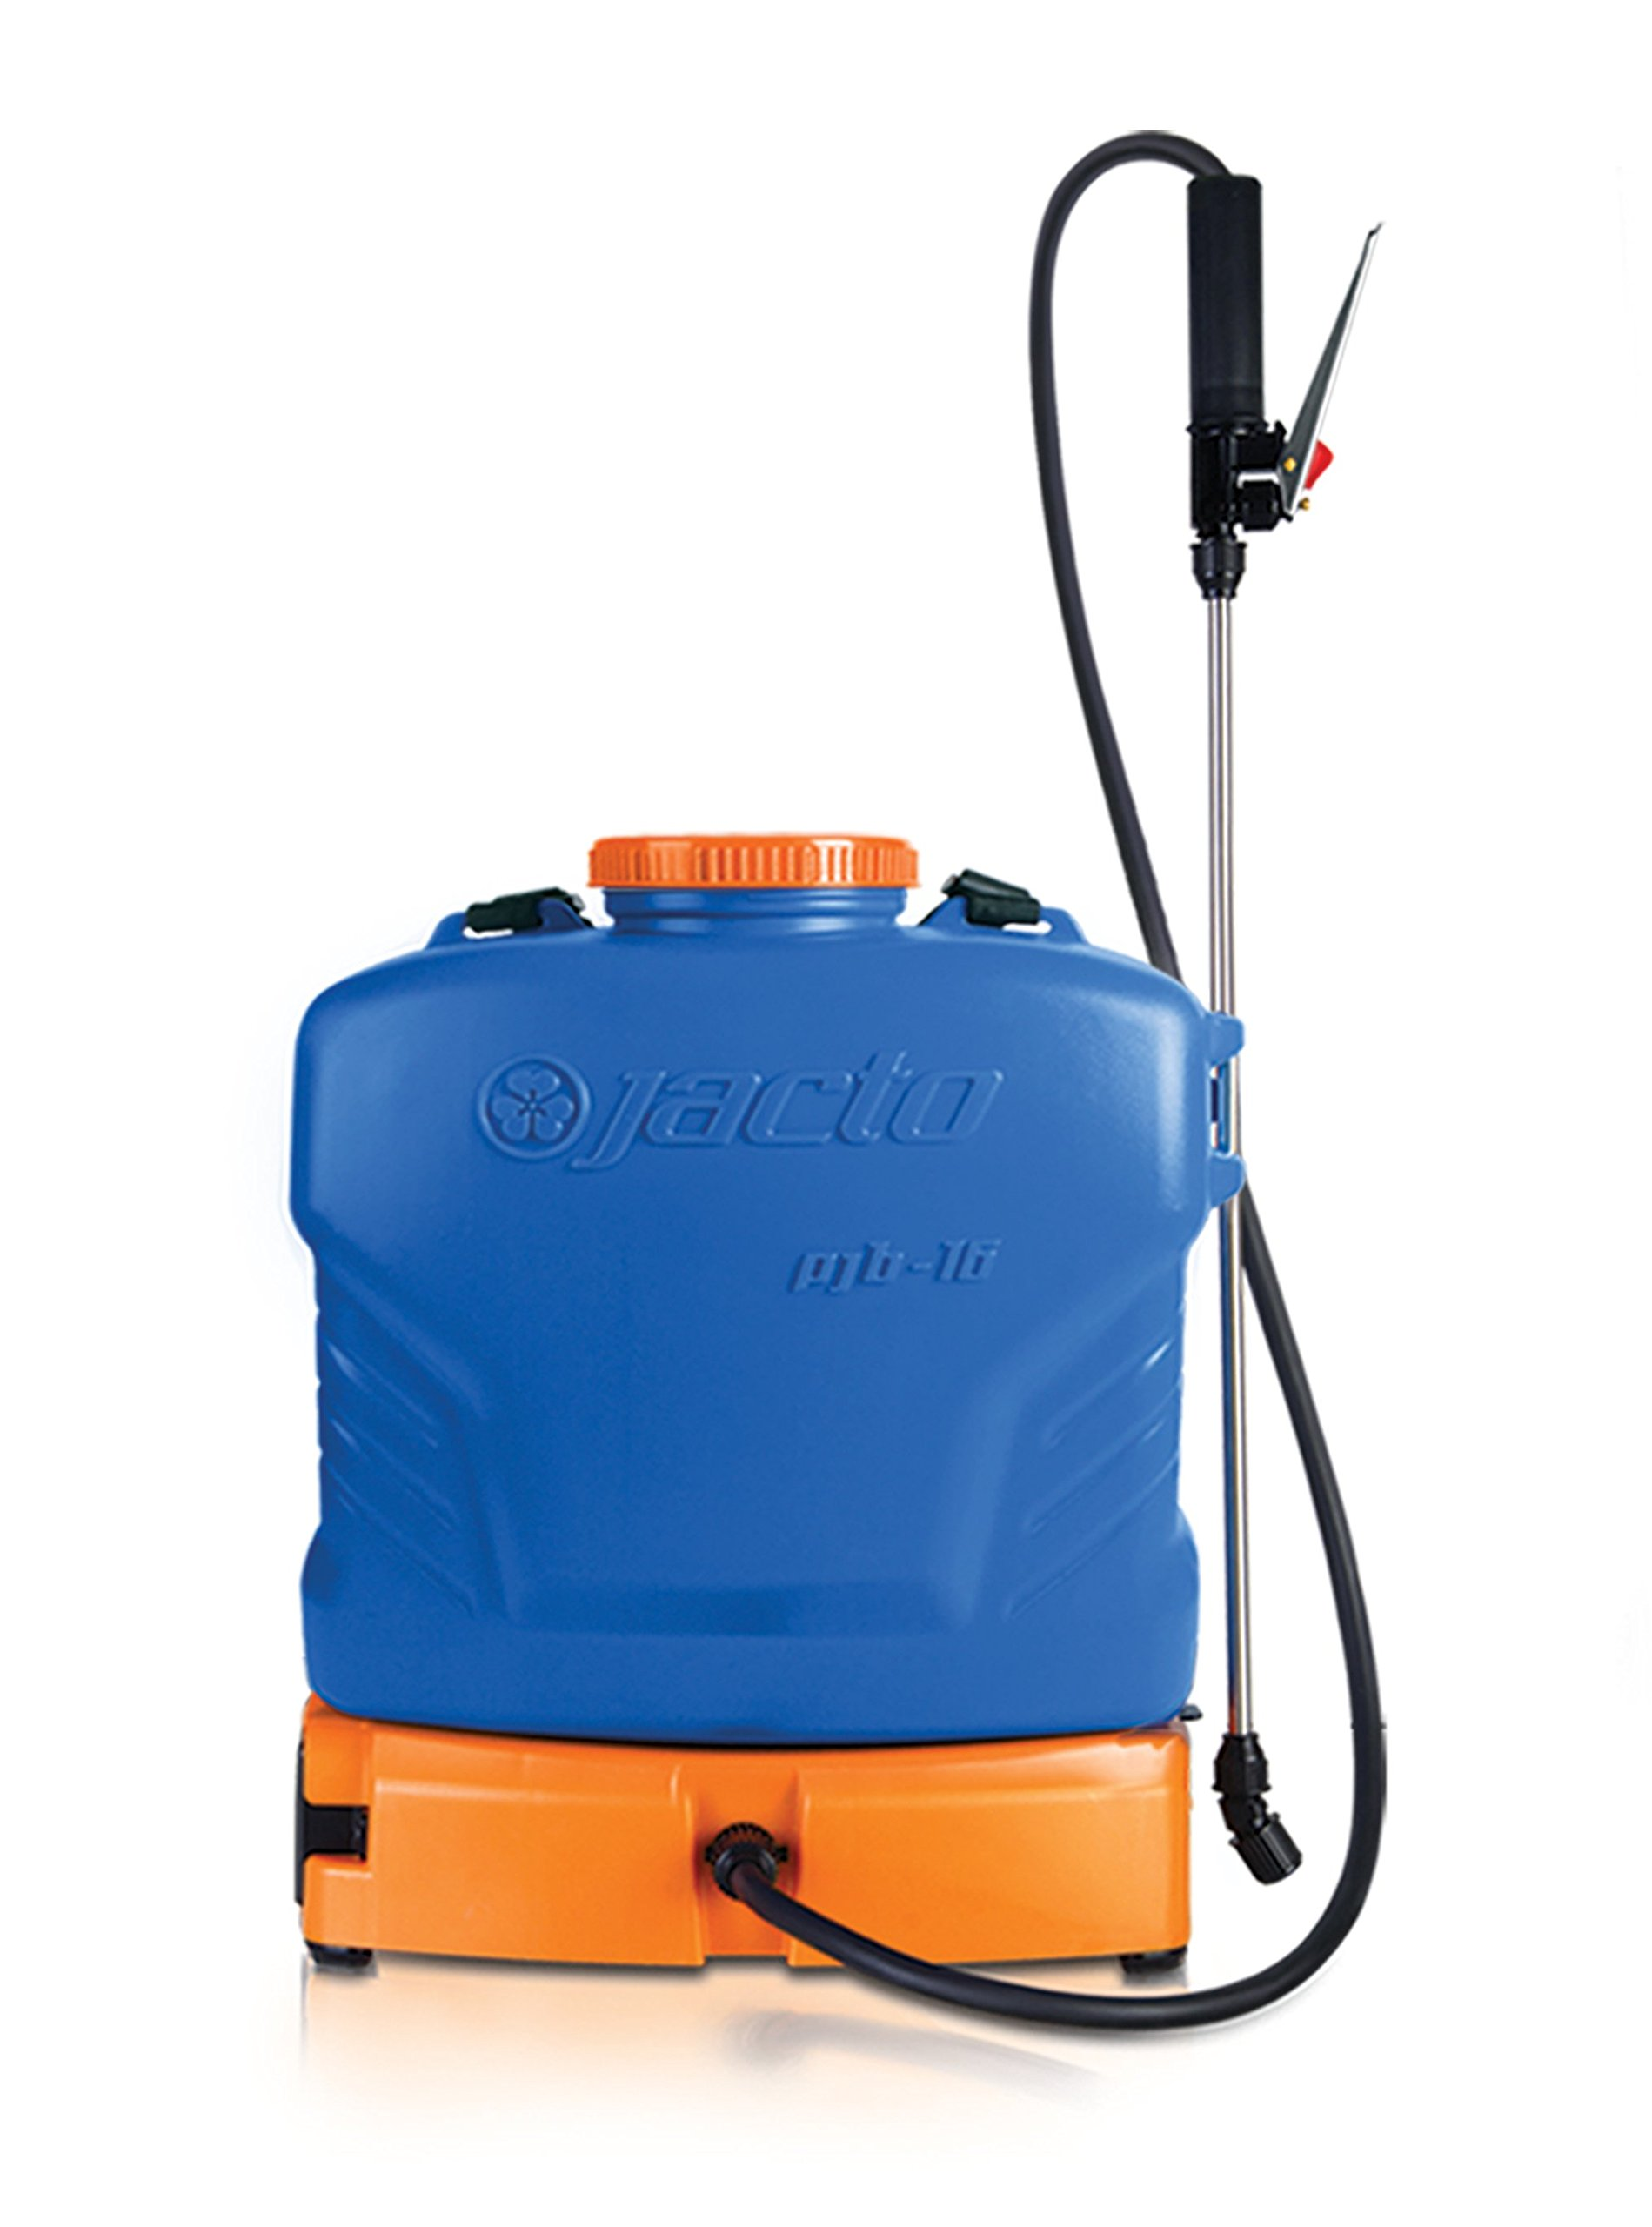 Jacto Backpack Sprayer, Blue